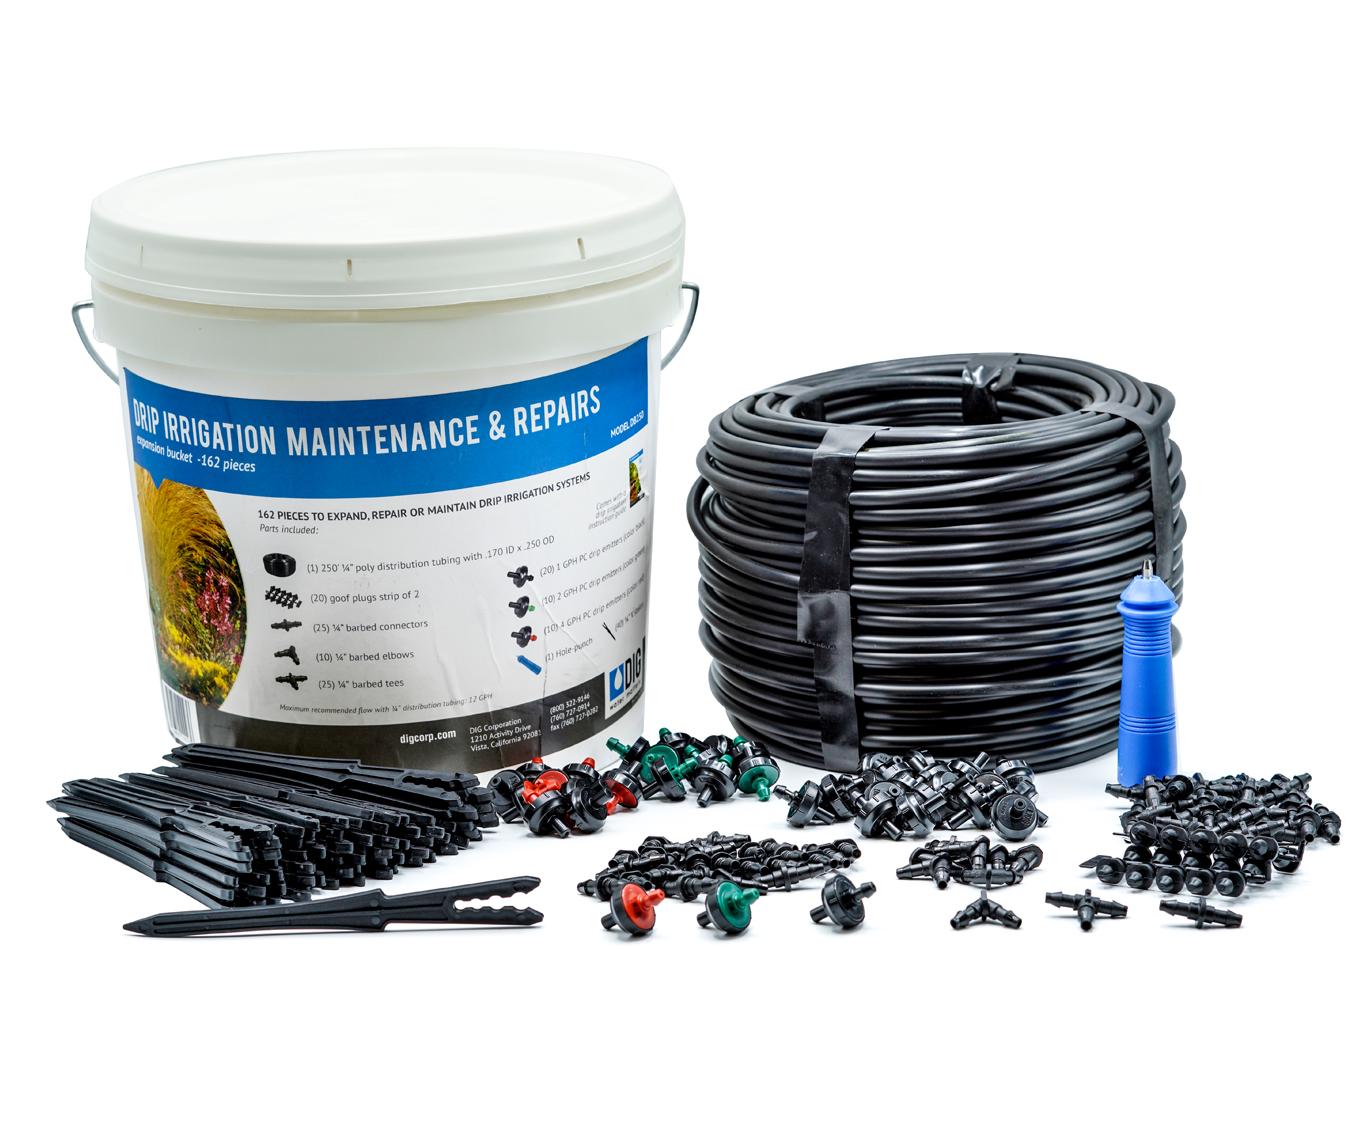 DB250 Maintenance & Repair Expansion Bucket